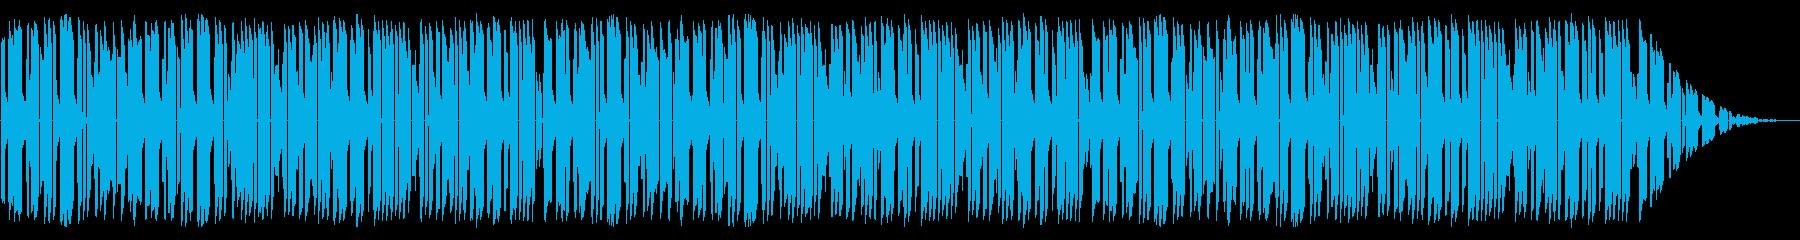 NES 汎用 C02-1(ステージ1) の再生済みの波形